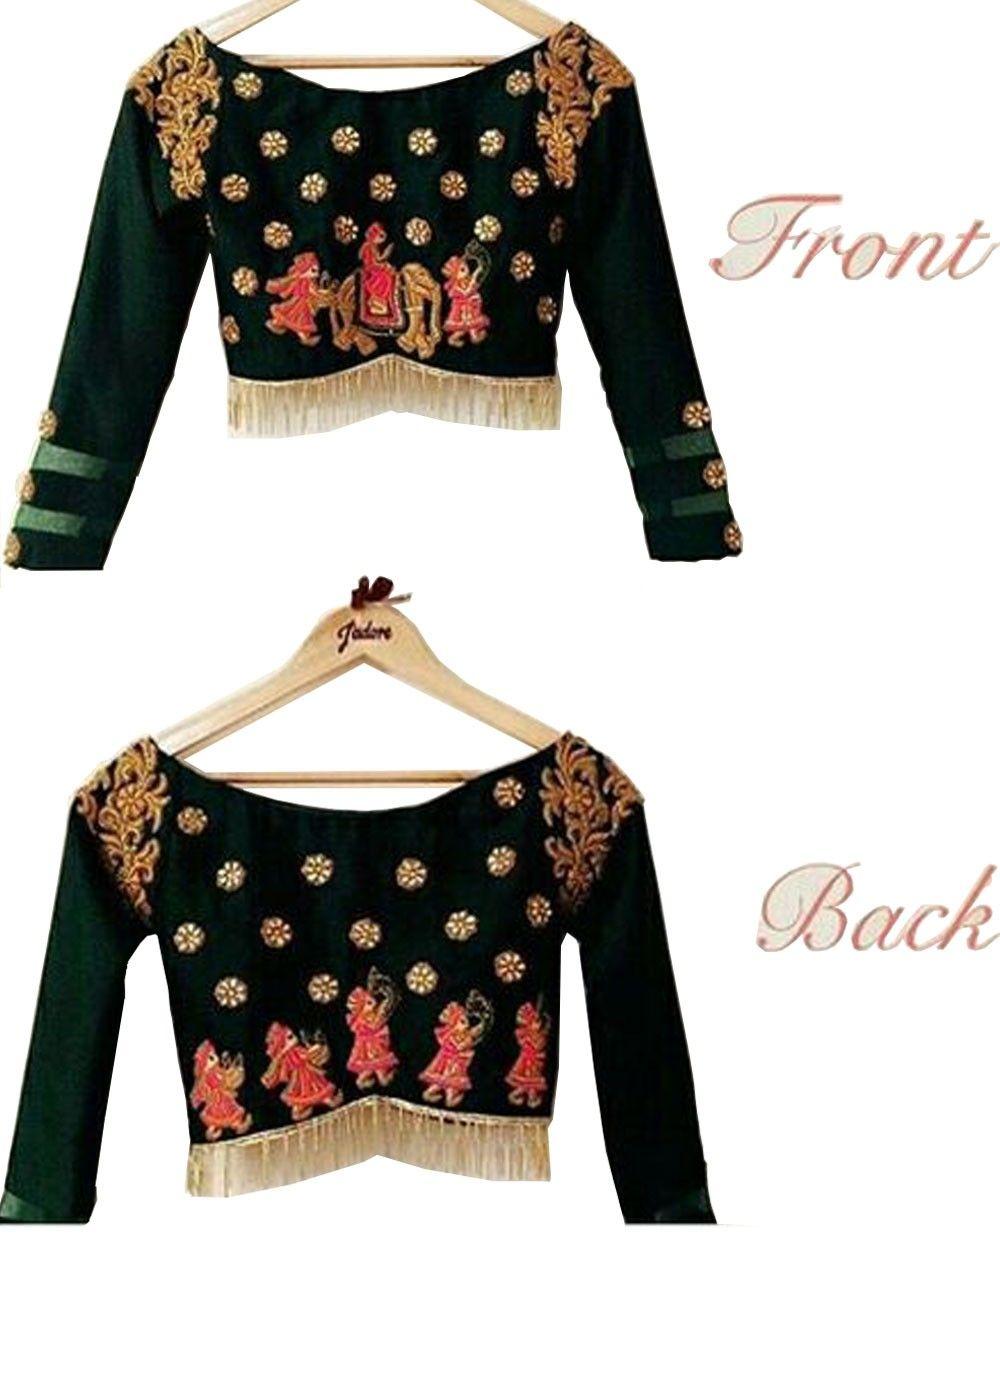 Saree blouse design cutting and stitching avityfashionroyalgreenantiquehandworksaree